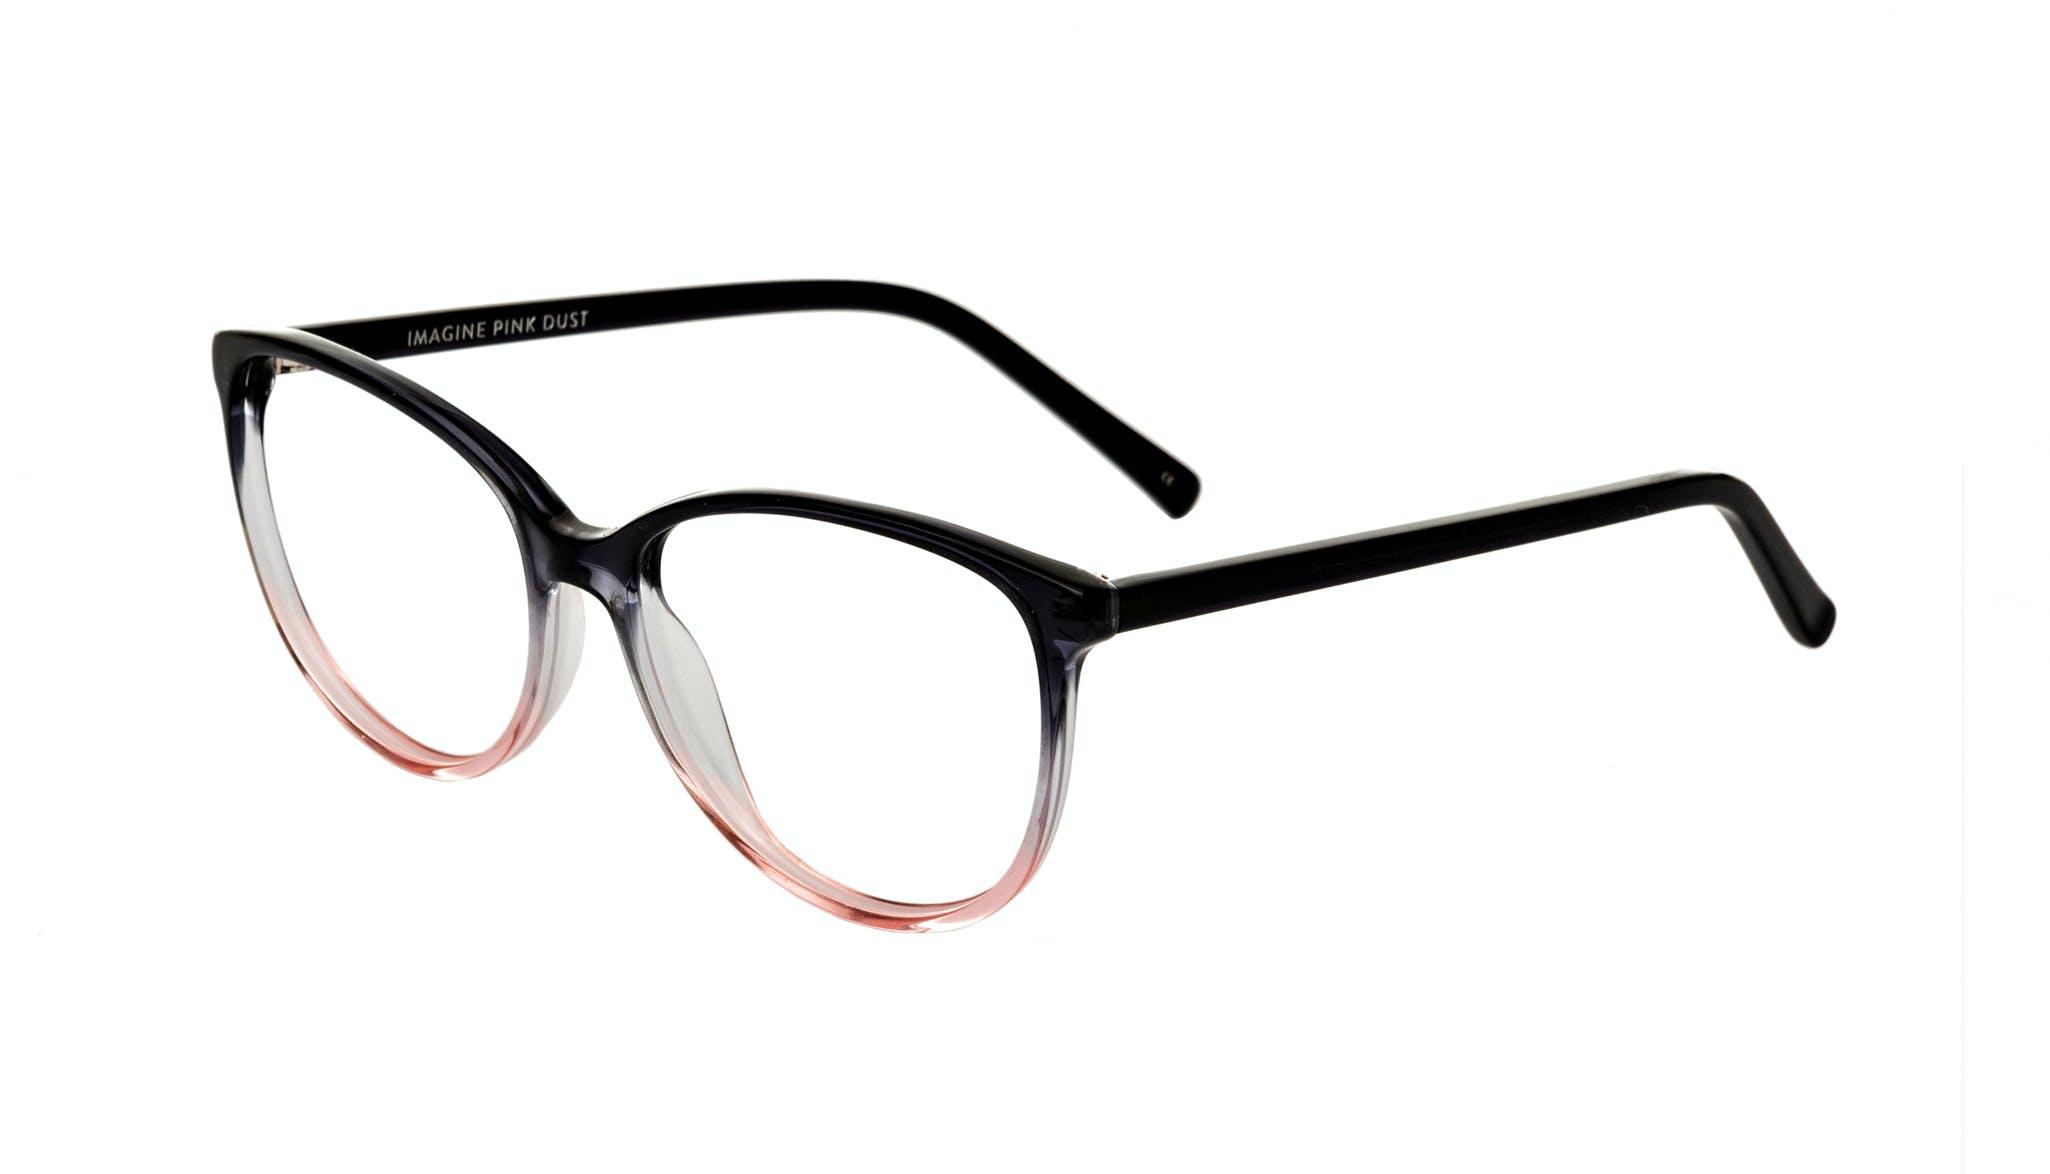 Affordable Fashion Glasses Round Eyeglasses Women Imagine Pink Dust Tilt